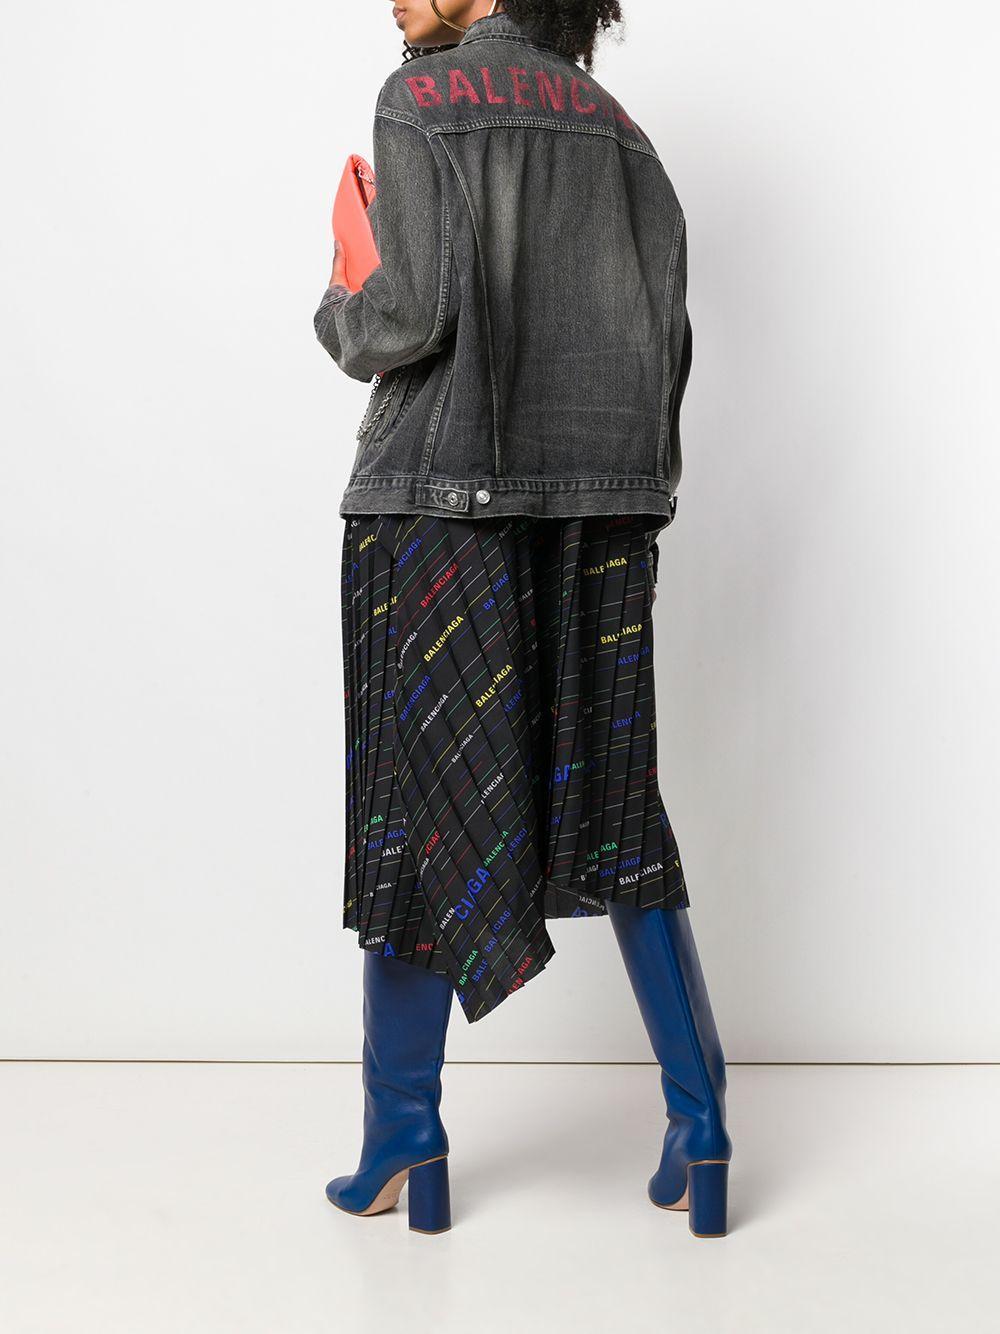 ee00630480aba4 Lyst - Balenciaga Logo Denim Jacket in Gray